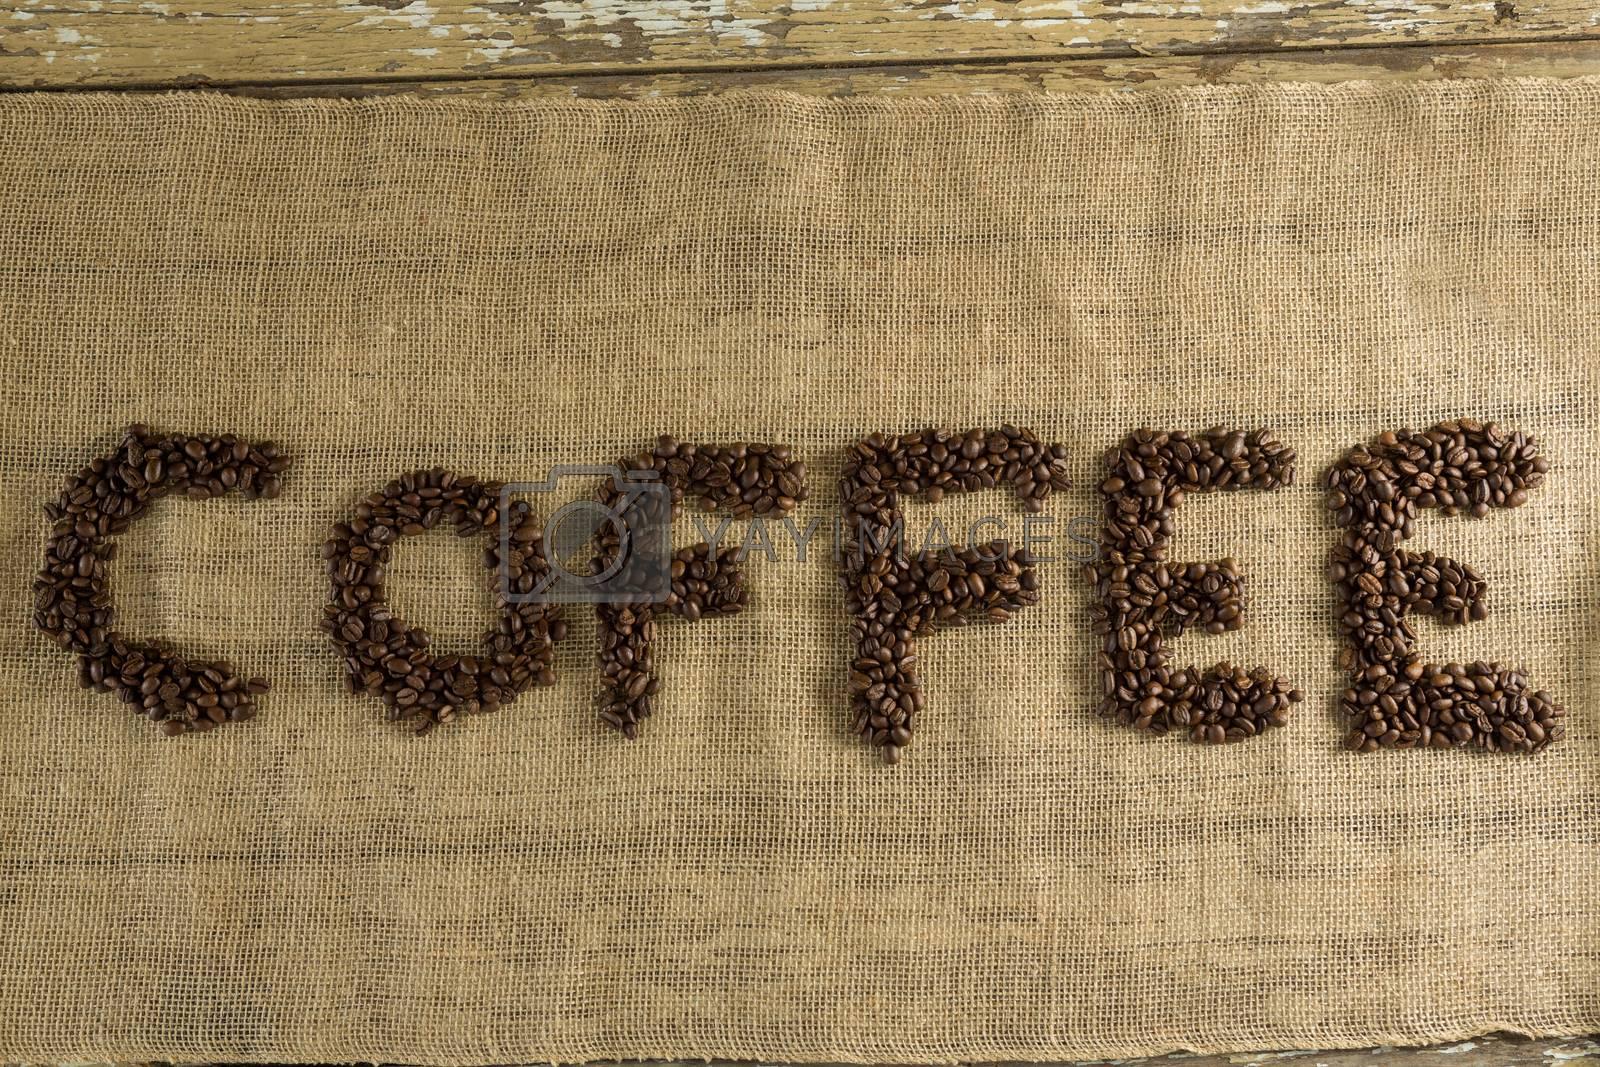 Word coffee arranged with coffee beans by Wavebreakmedia